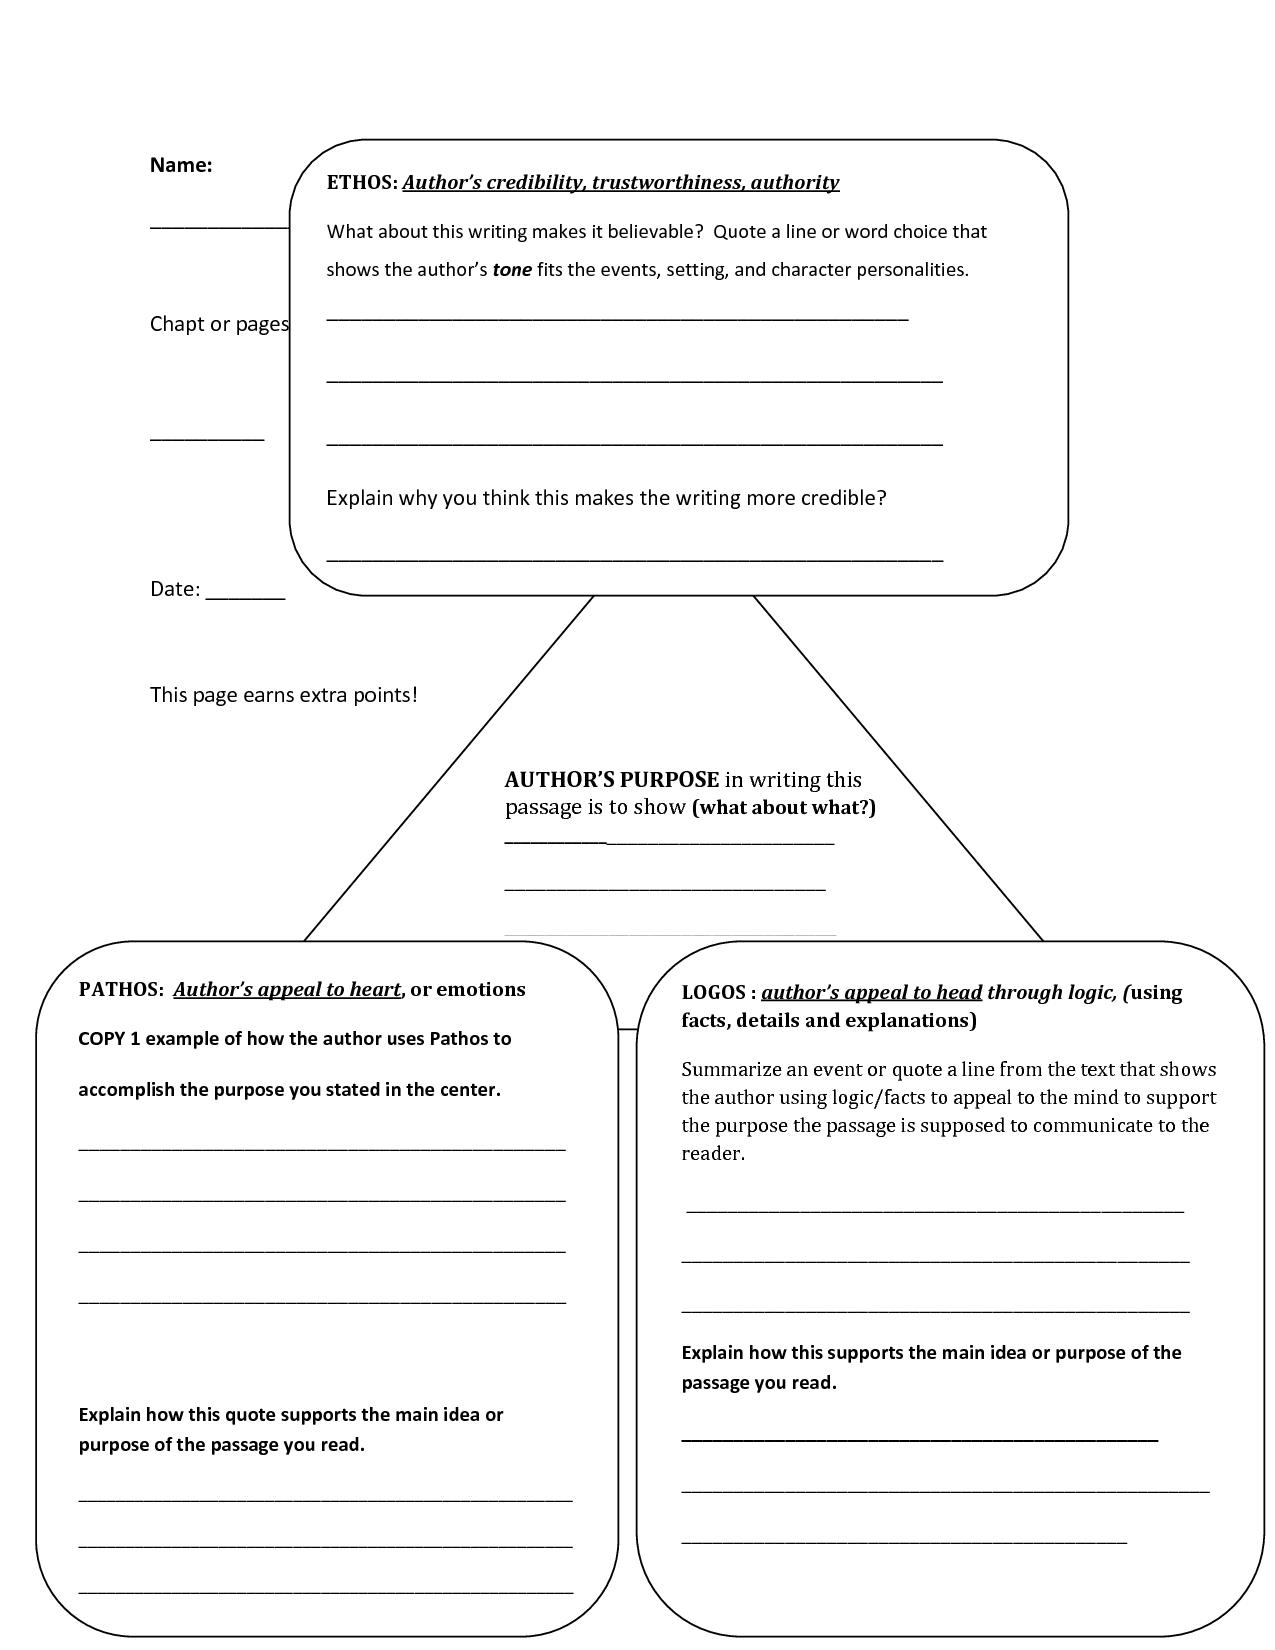 worksheet Drama Triangle Worksheet rhetorical triangle worksheet google search classroom search